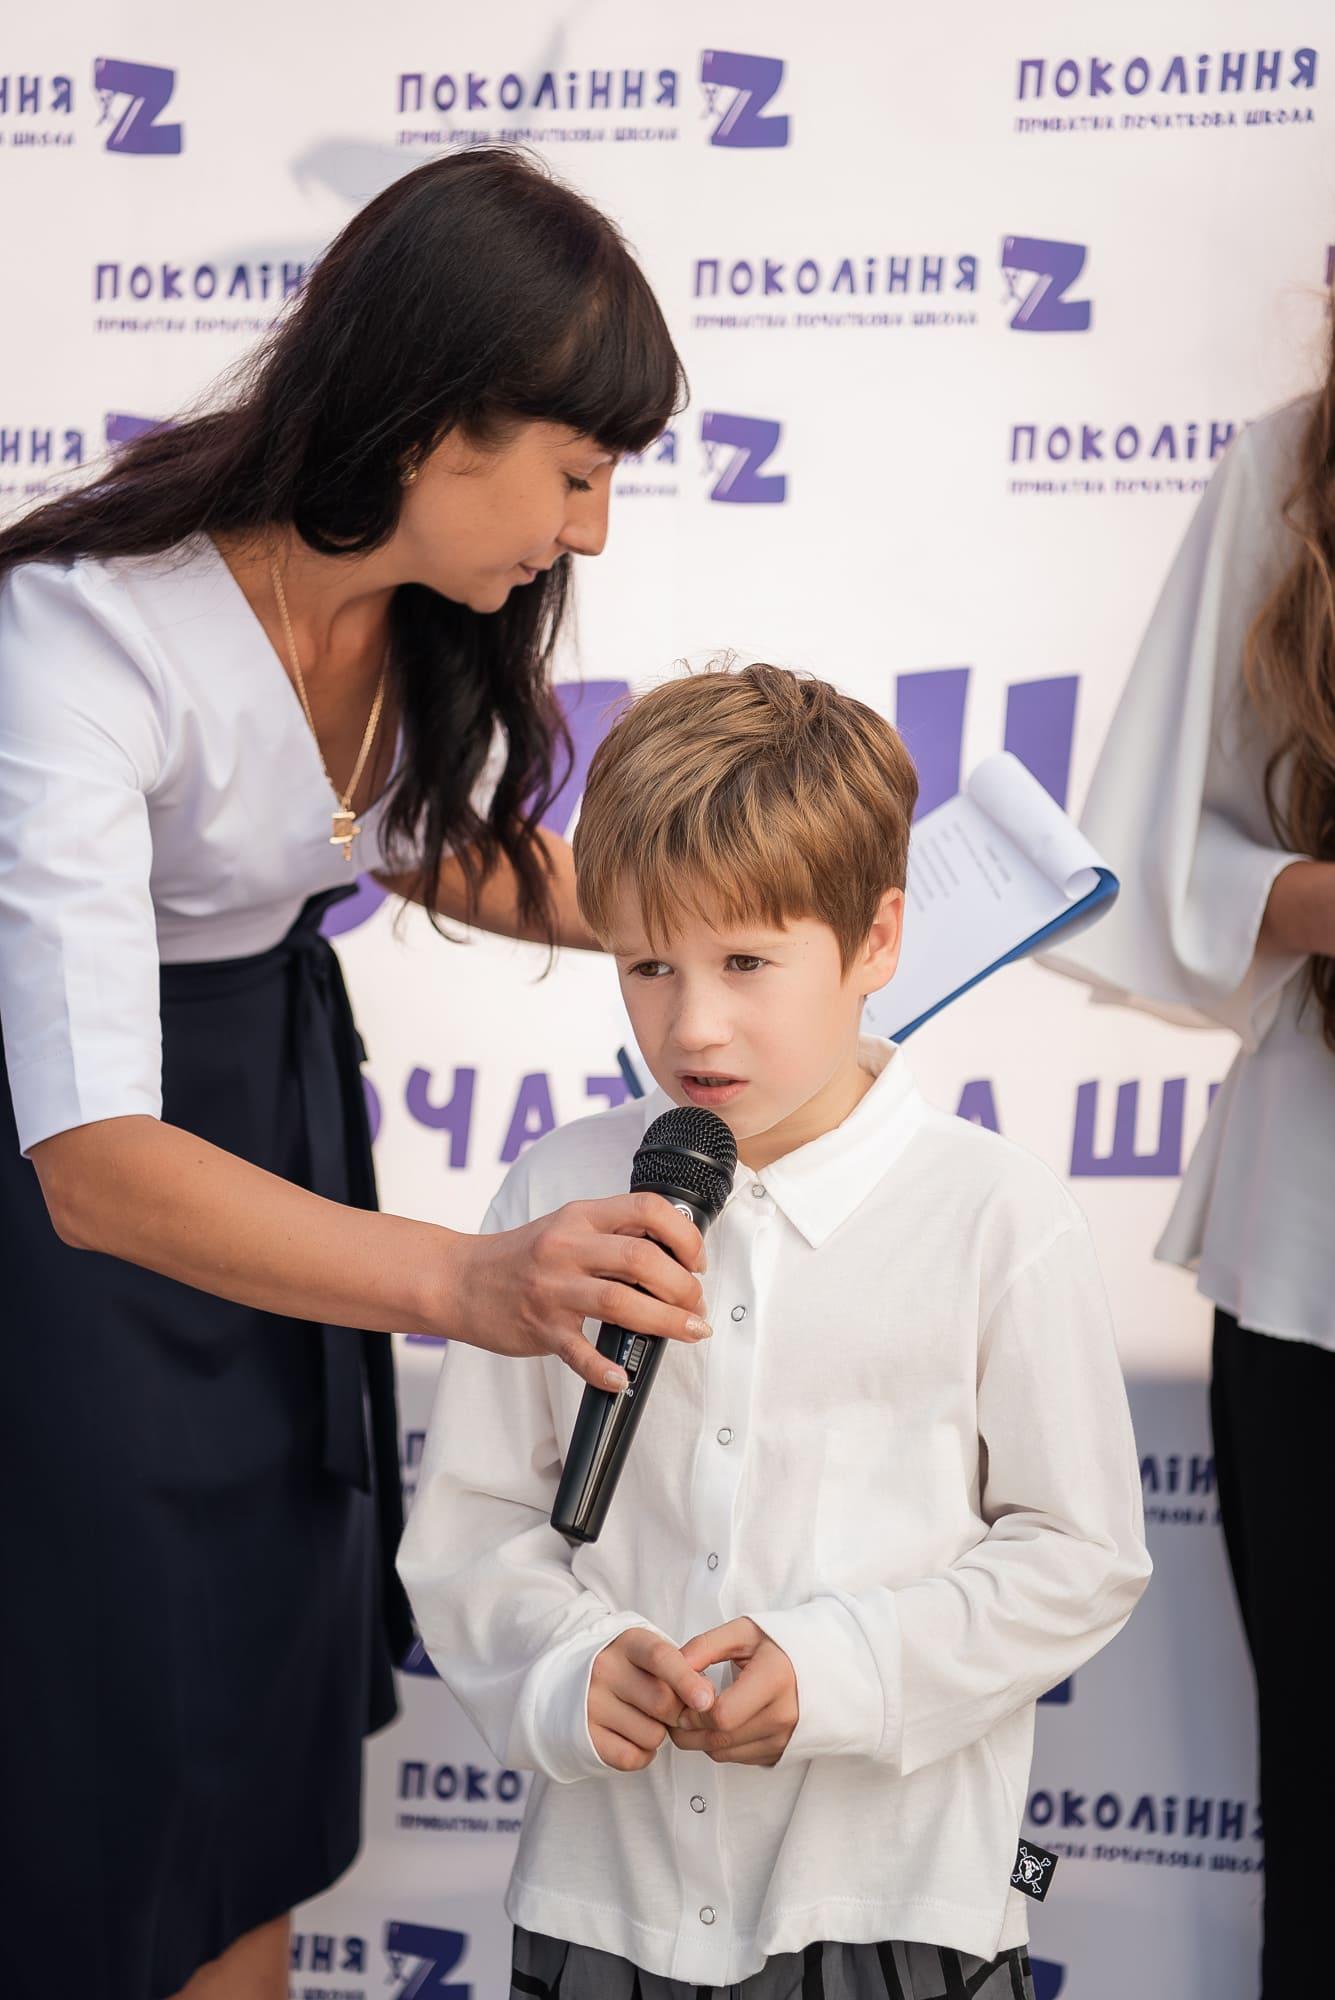 https://akademia-detstva.od.ua/app/uploads/2021/09/168.jpg